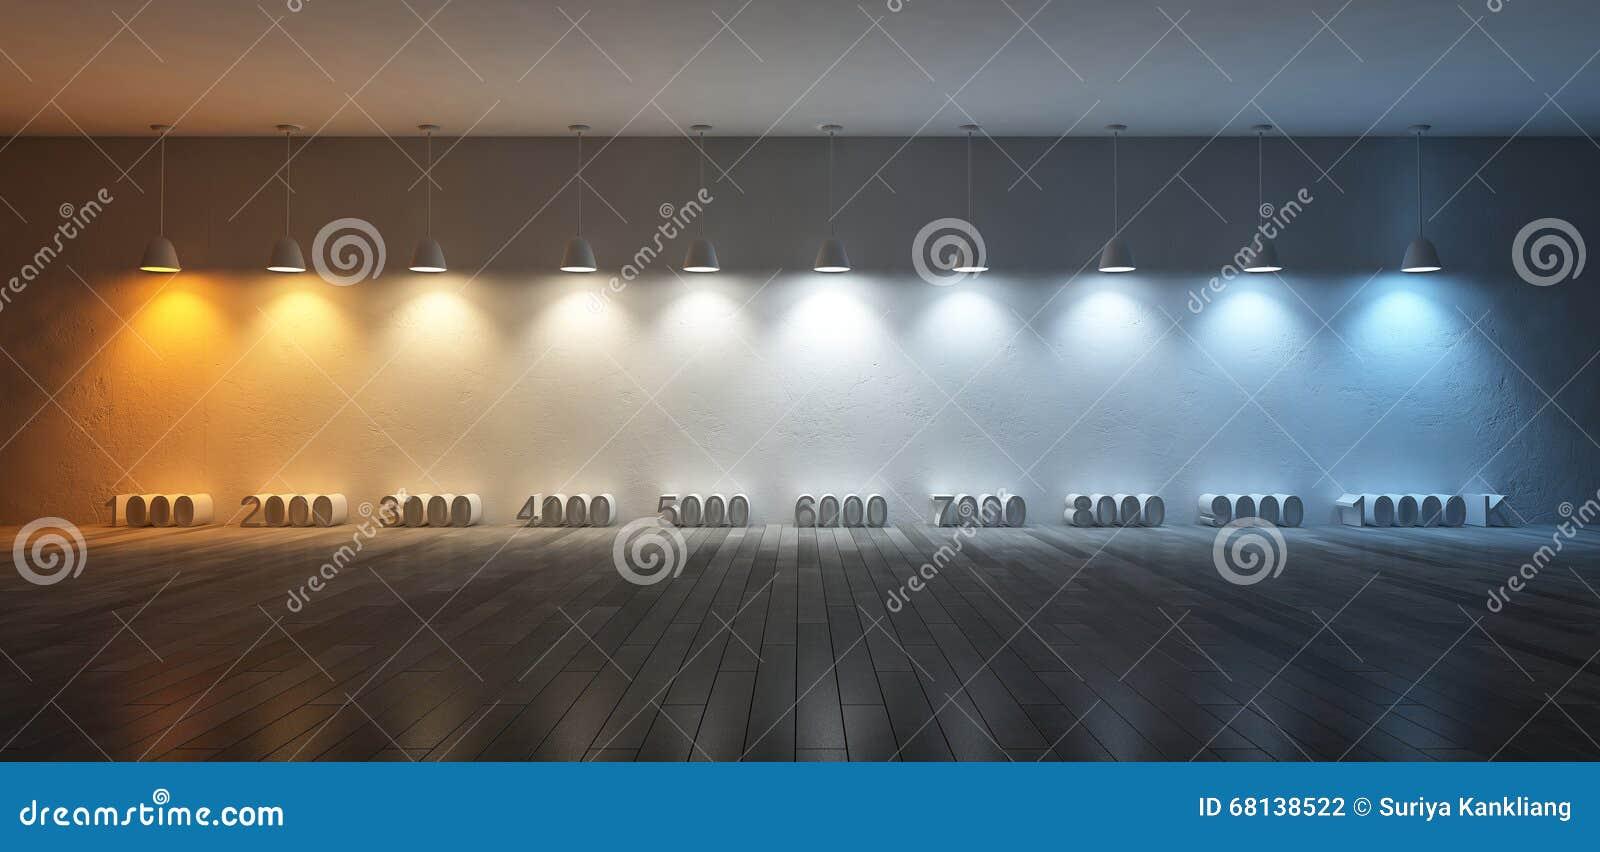 3ds Color Temperature Scale Stock Photo Image 68138522